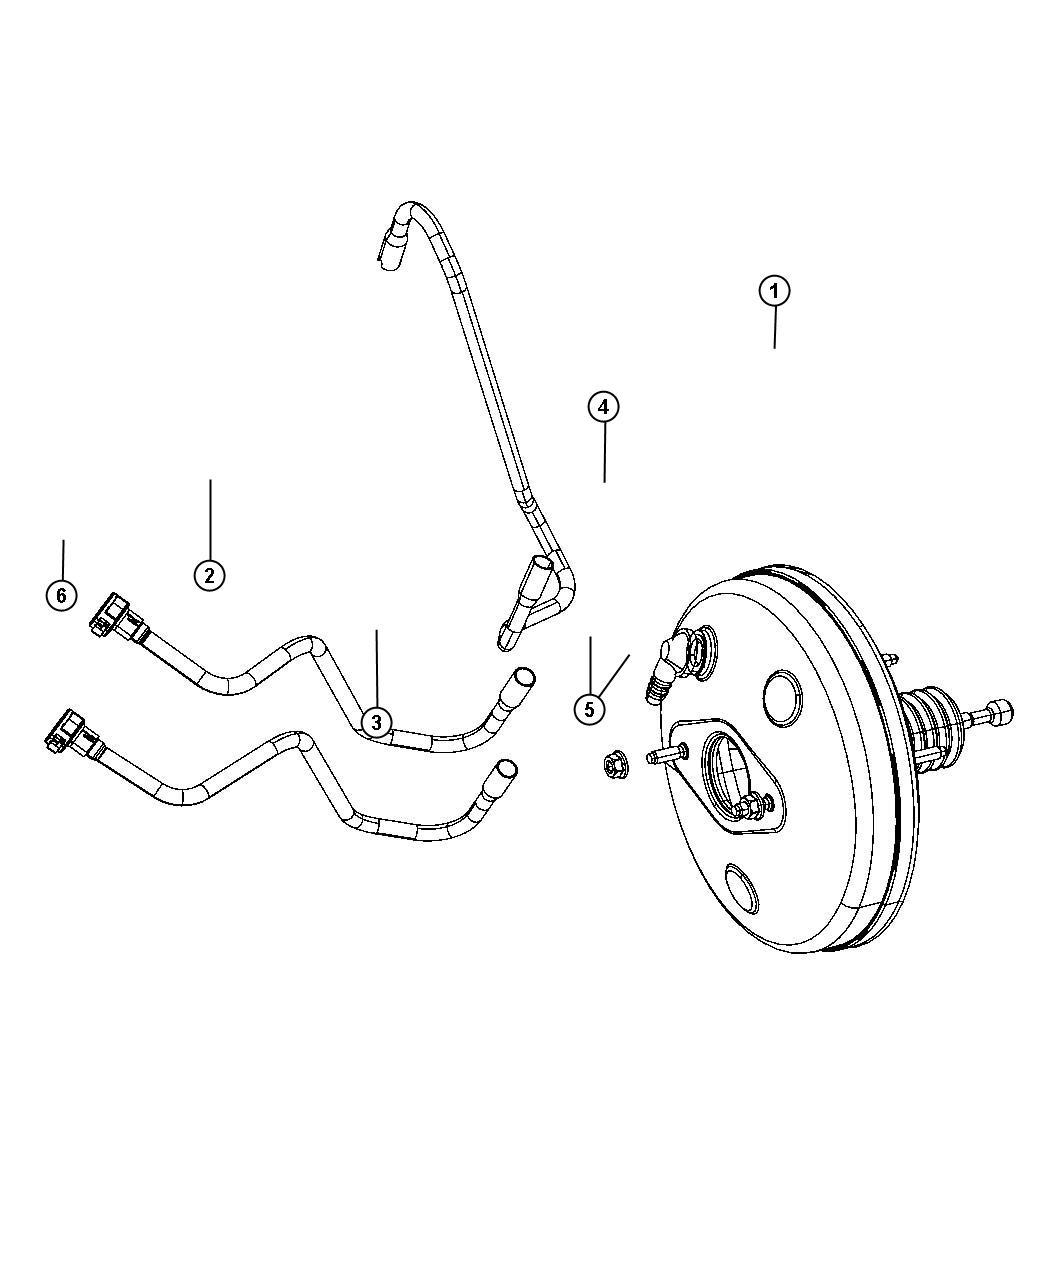 2012 Fiat 500 Booster. Power brake. Wheel, disc, brakes